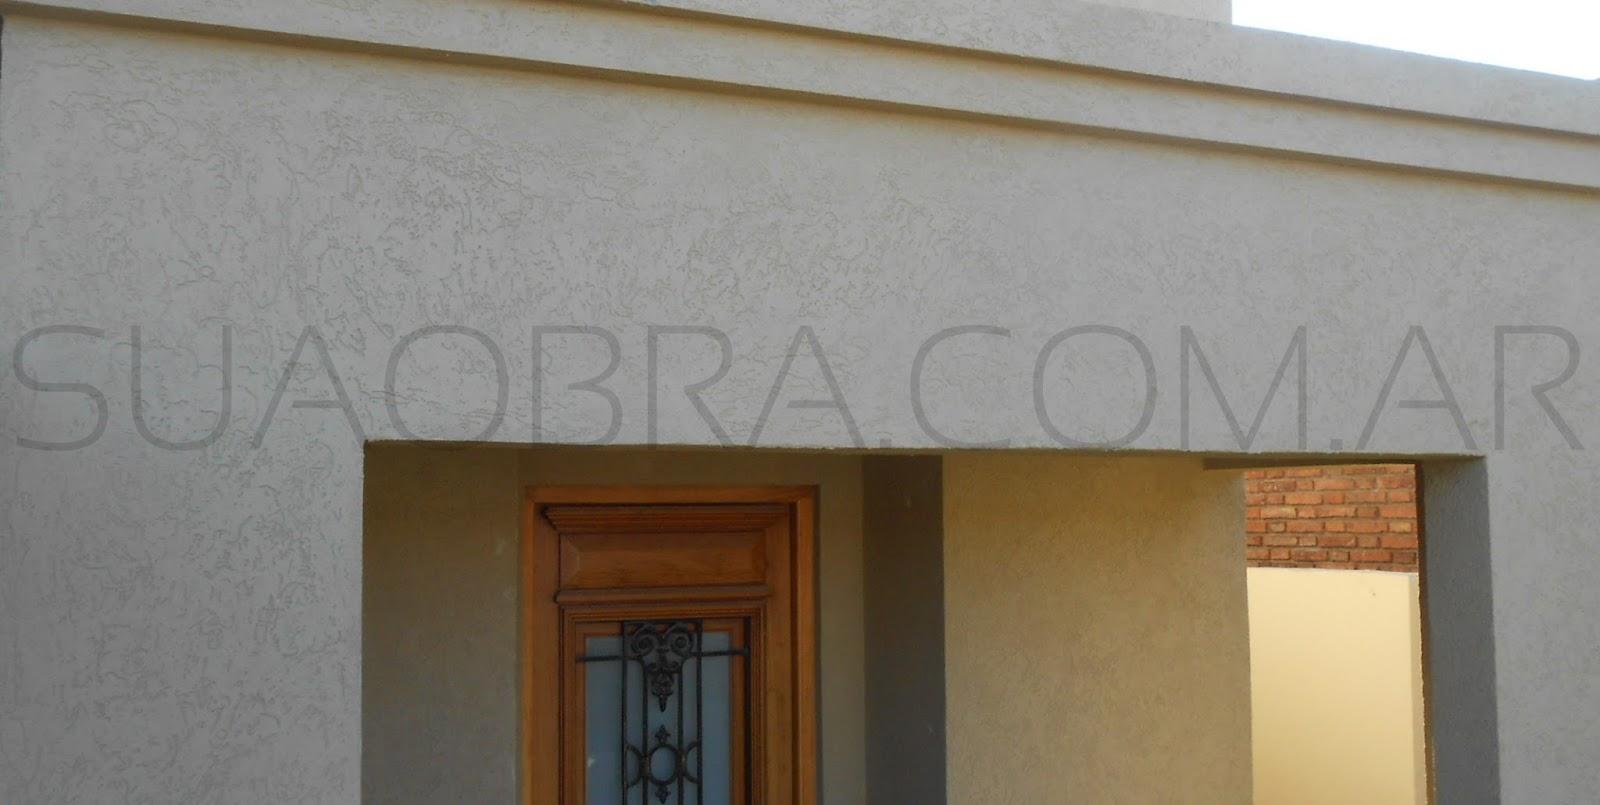 revestimiento plstico tarquini tarquini piedra paris colocacin comercializacion zona norte - Revestimiento Exterior